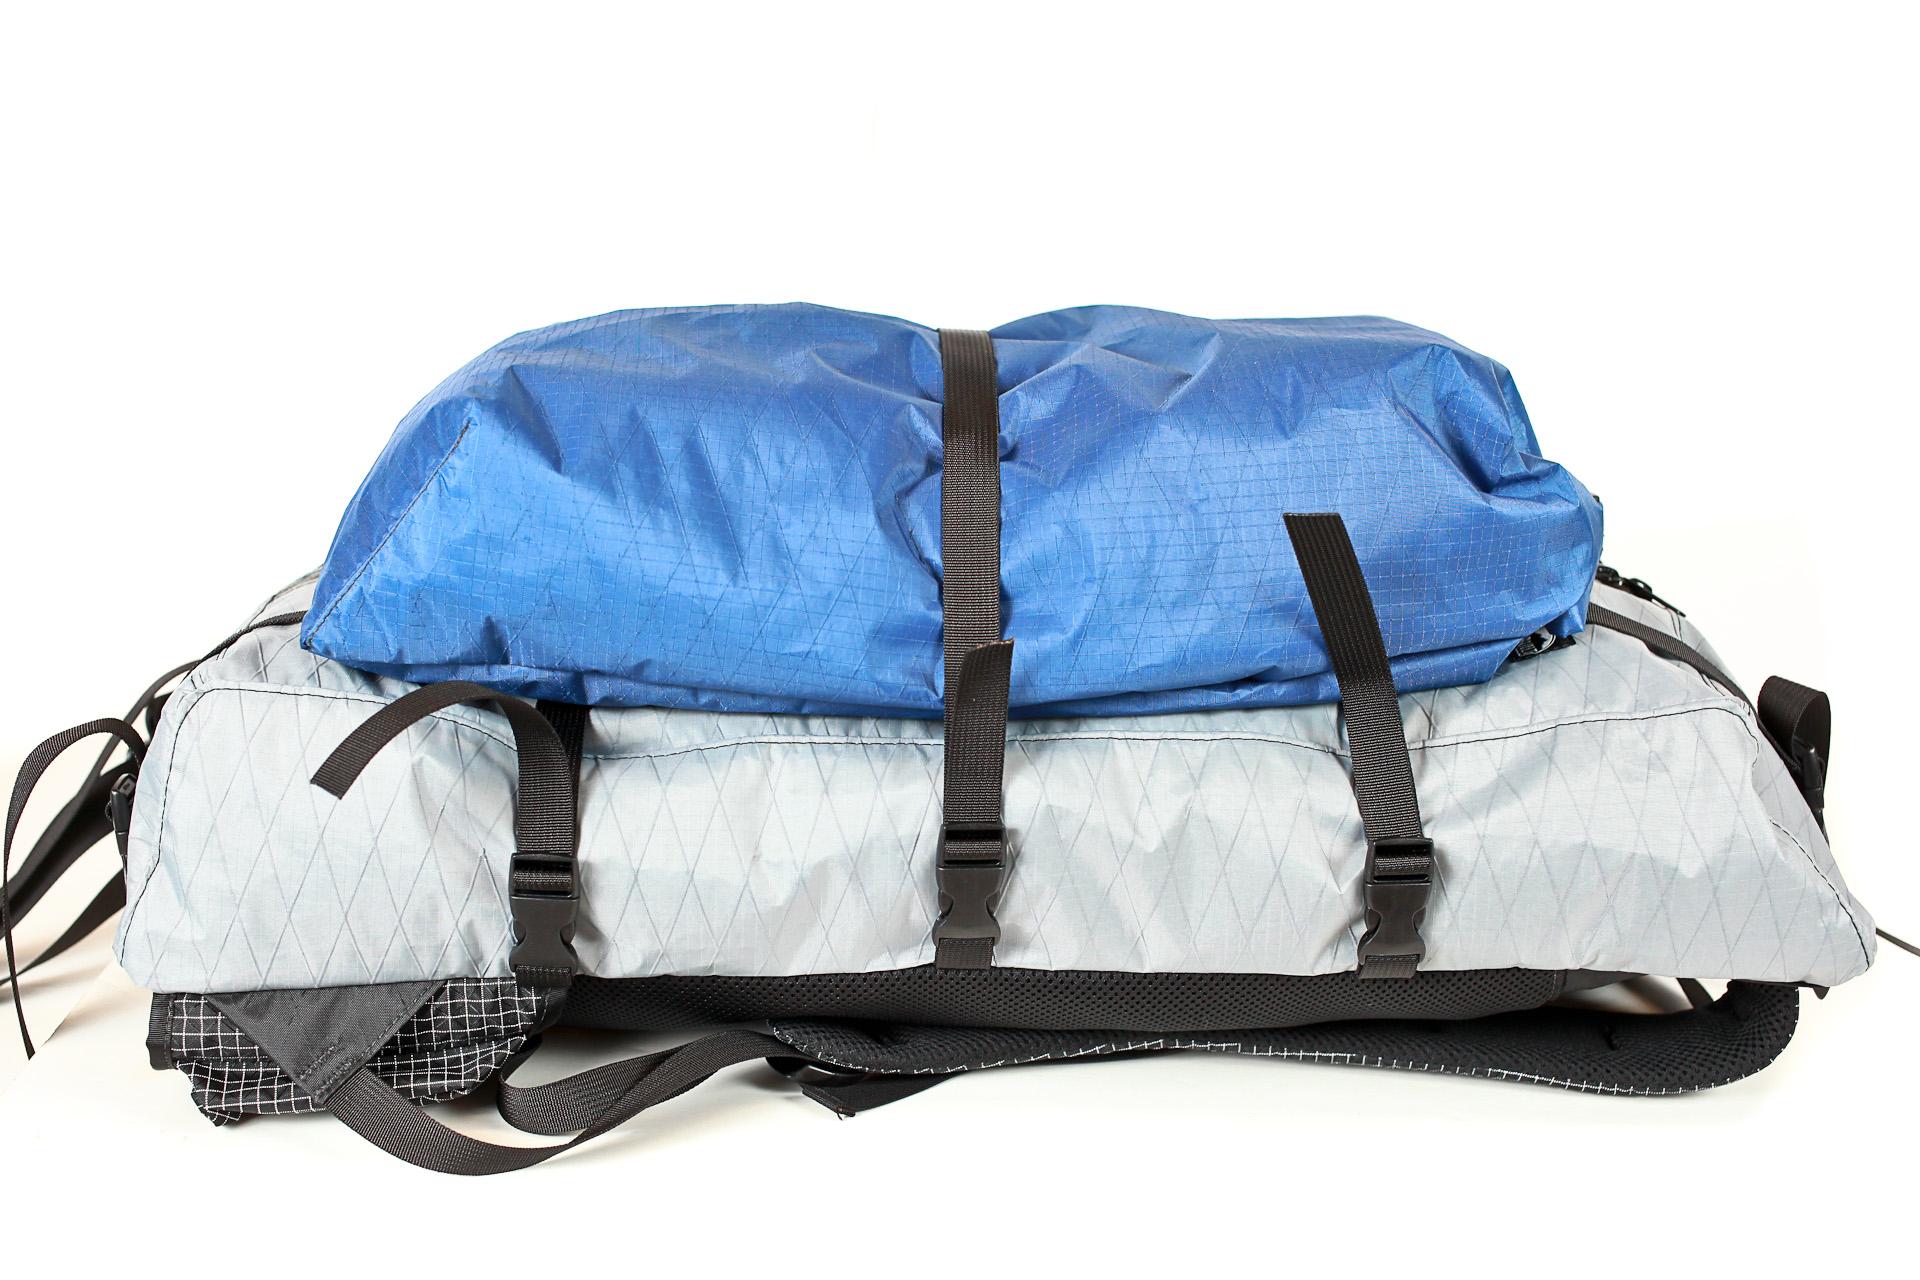 Zimmerbuilt custom pack with detachable food bag